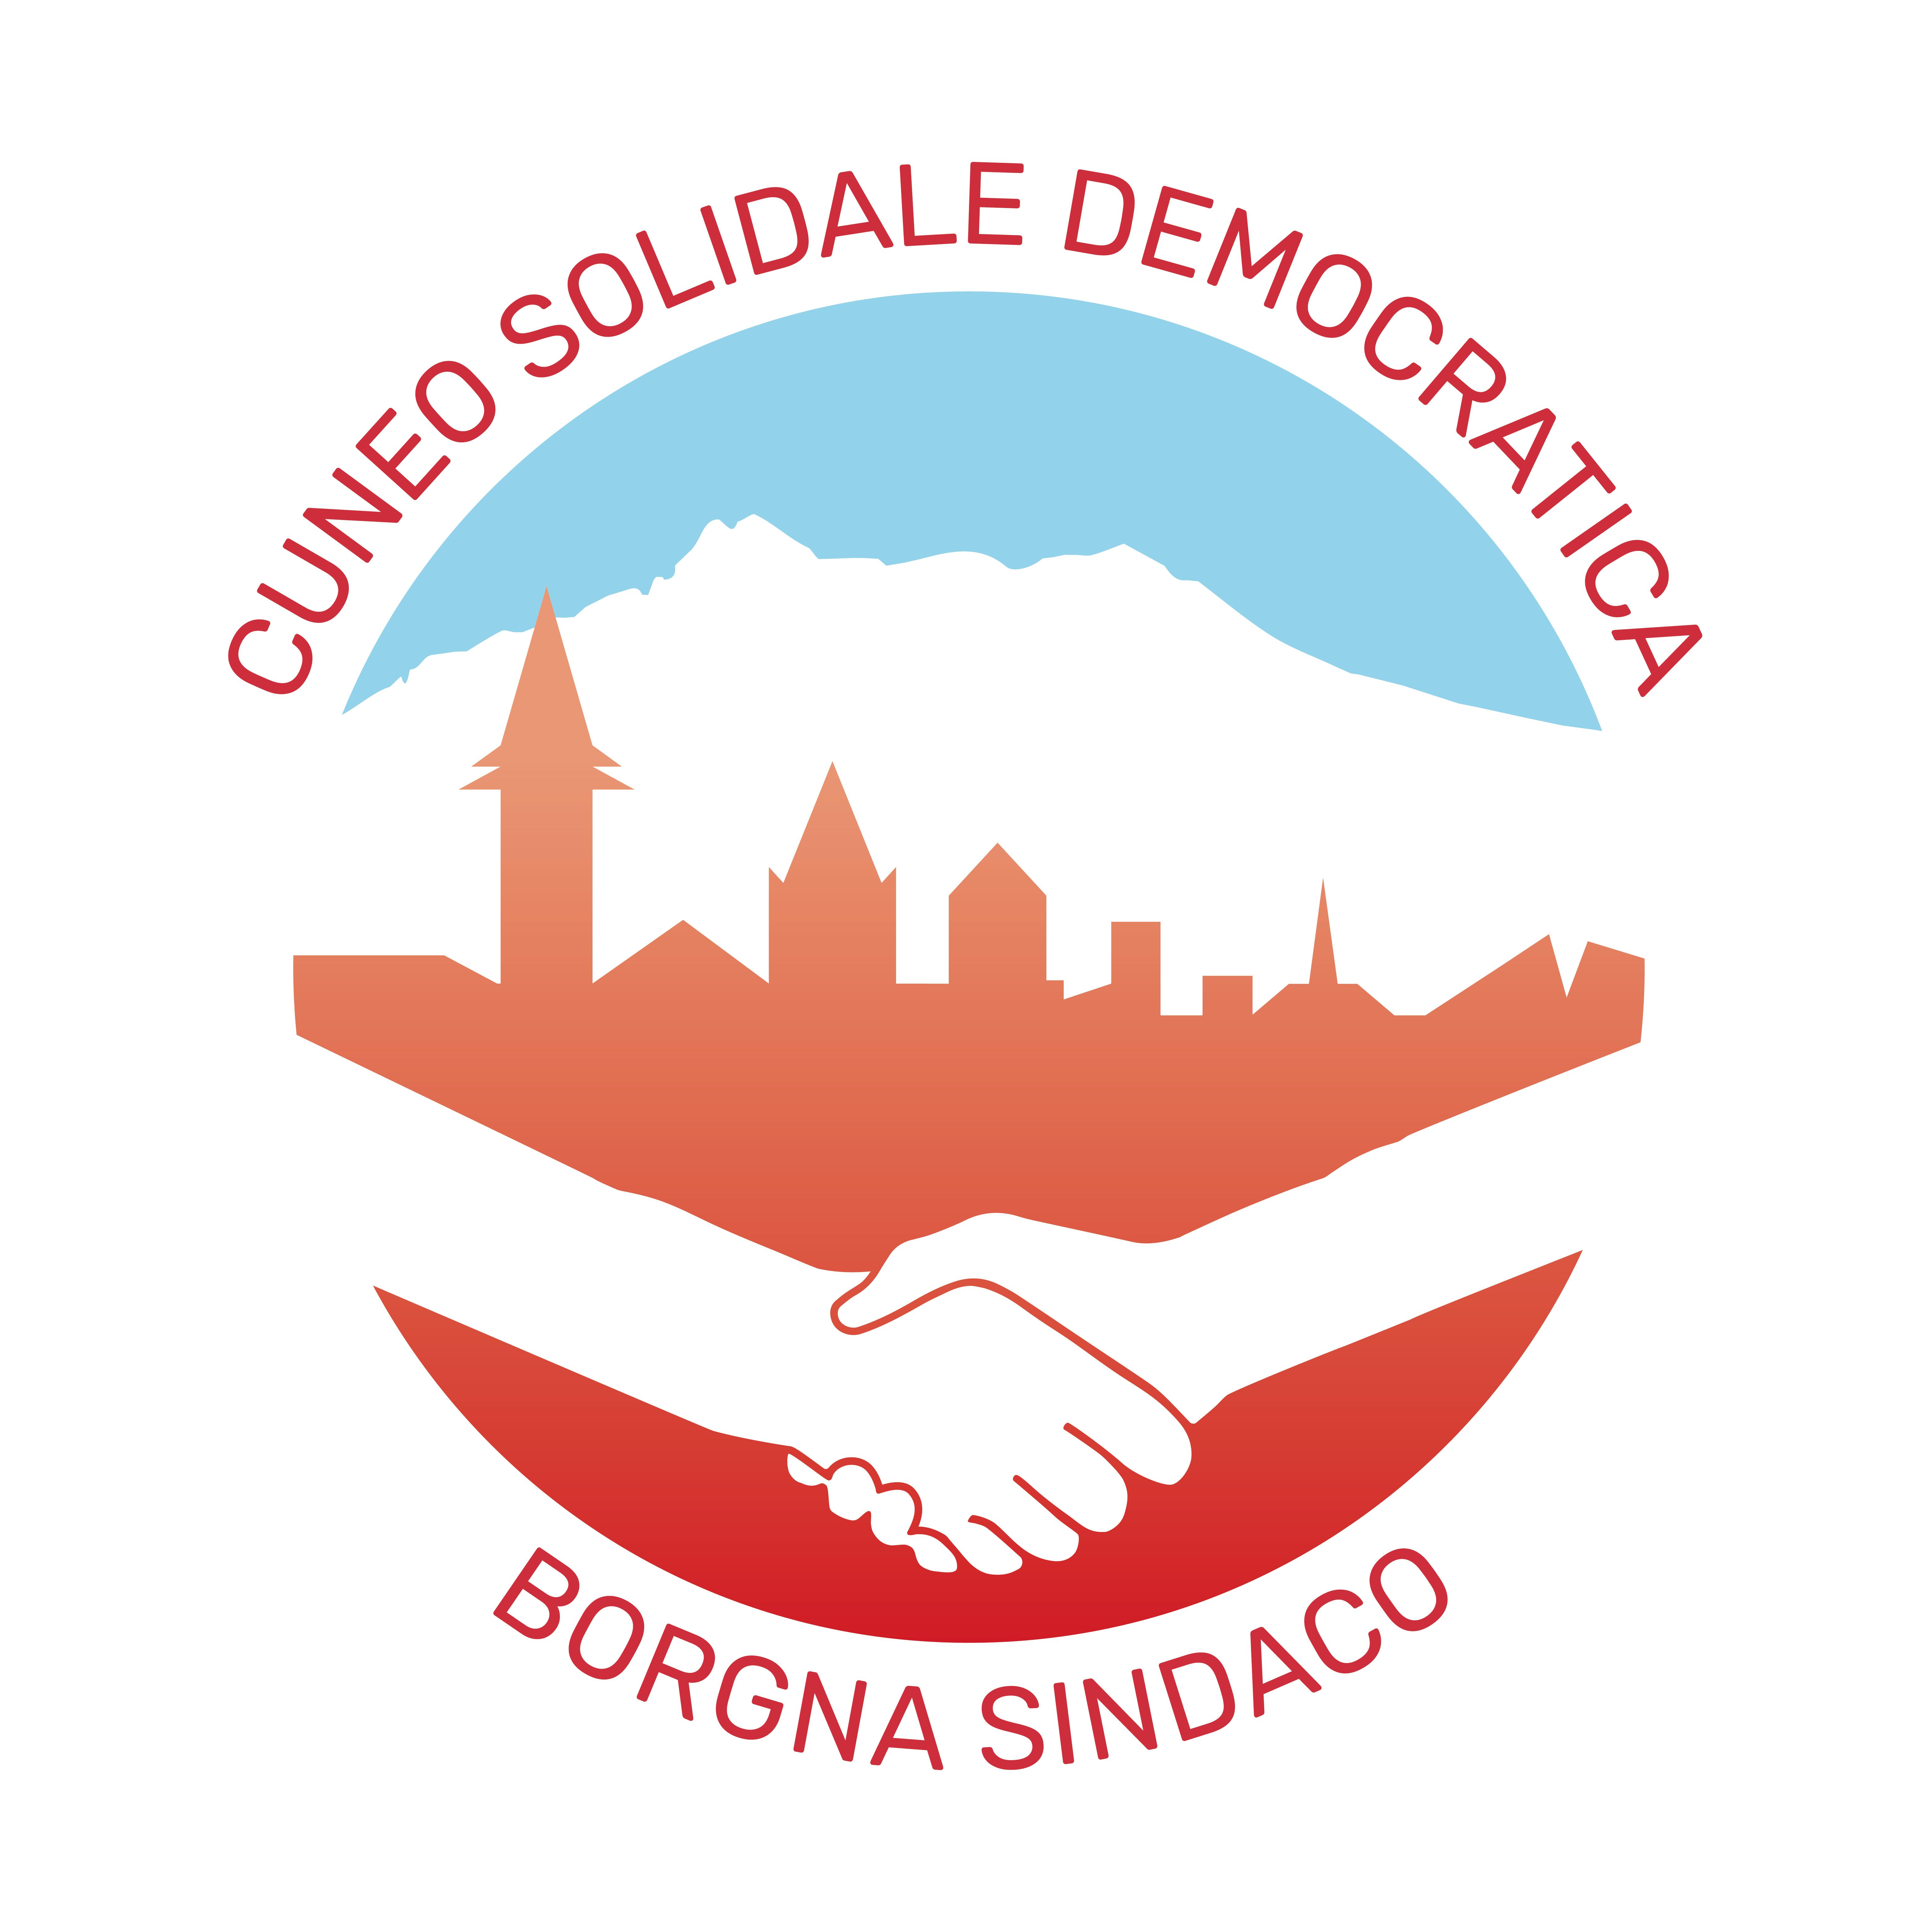 Cuneo Solidale Democratica